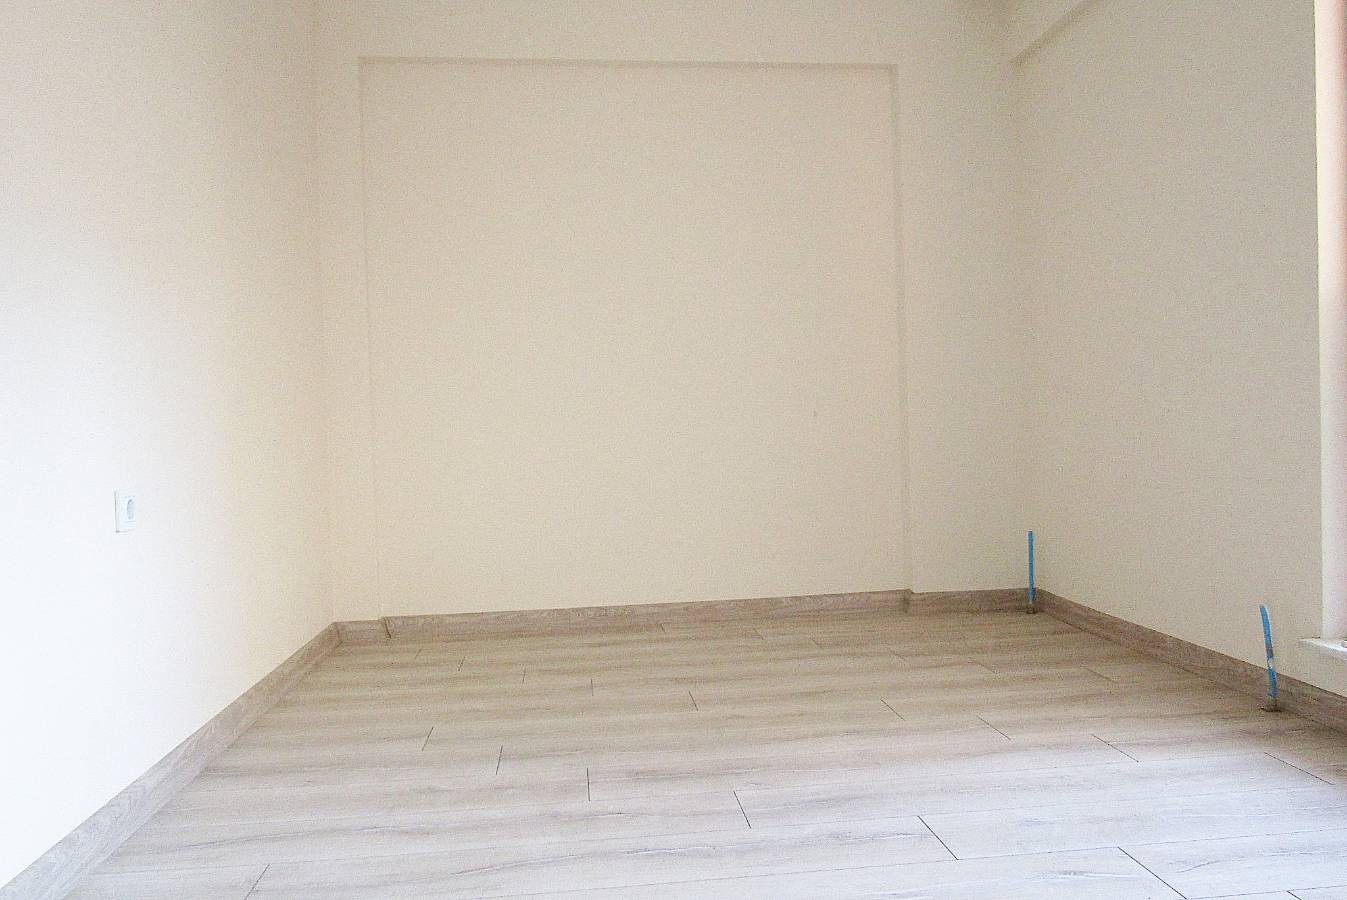 SR EMLAK'TAN İSTASYON MAH'DE 4+1 170m² DUBLEX SIFIR DAİRE